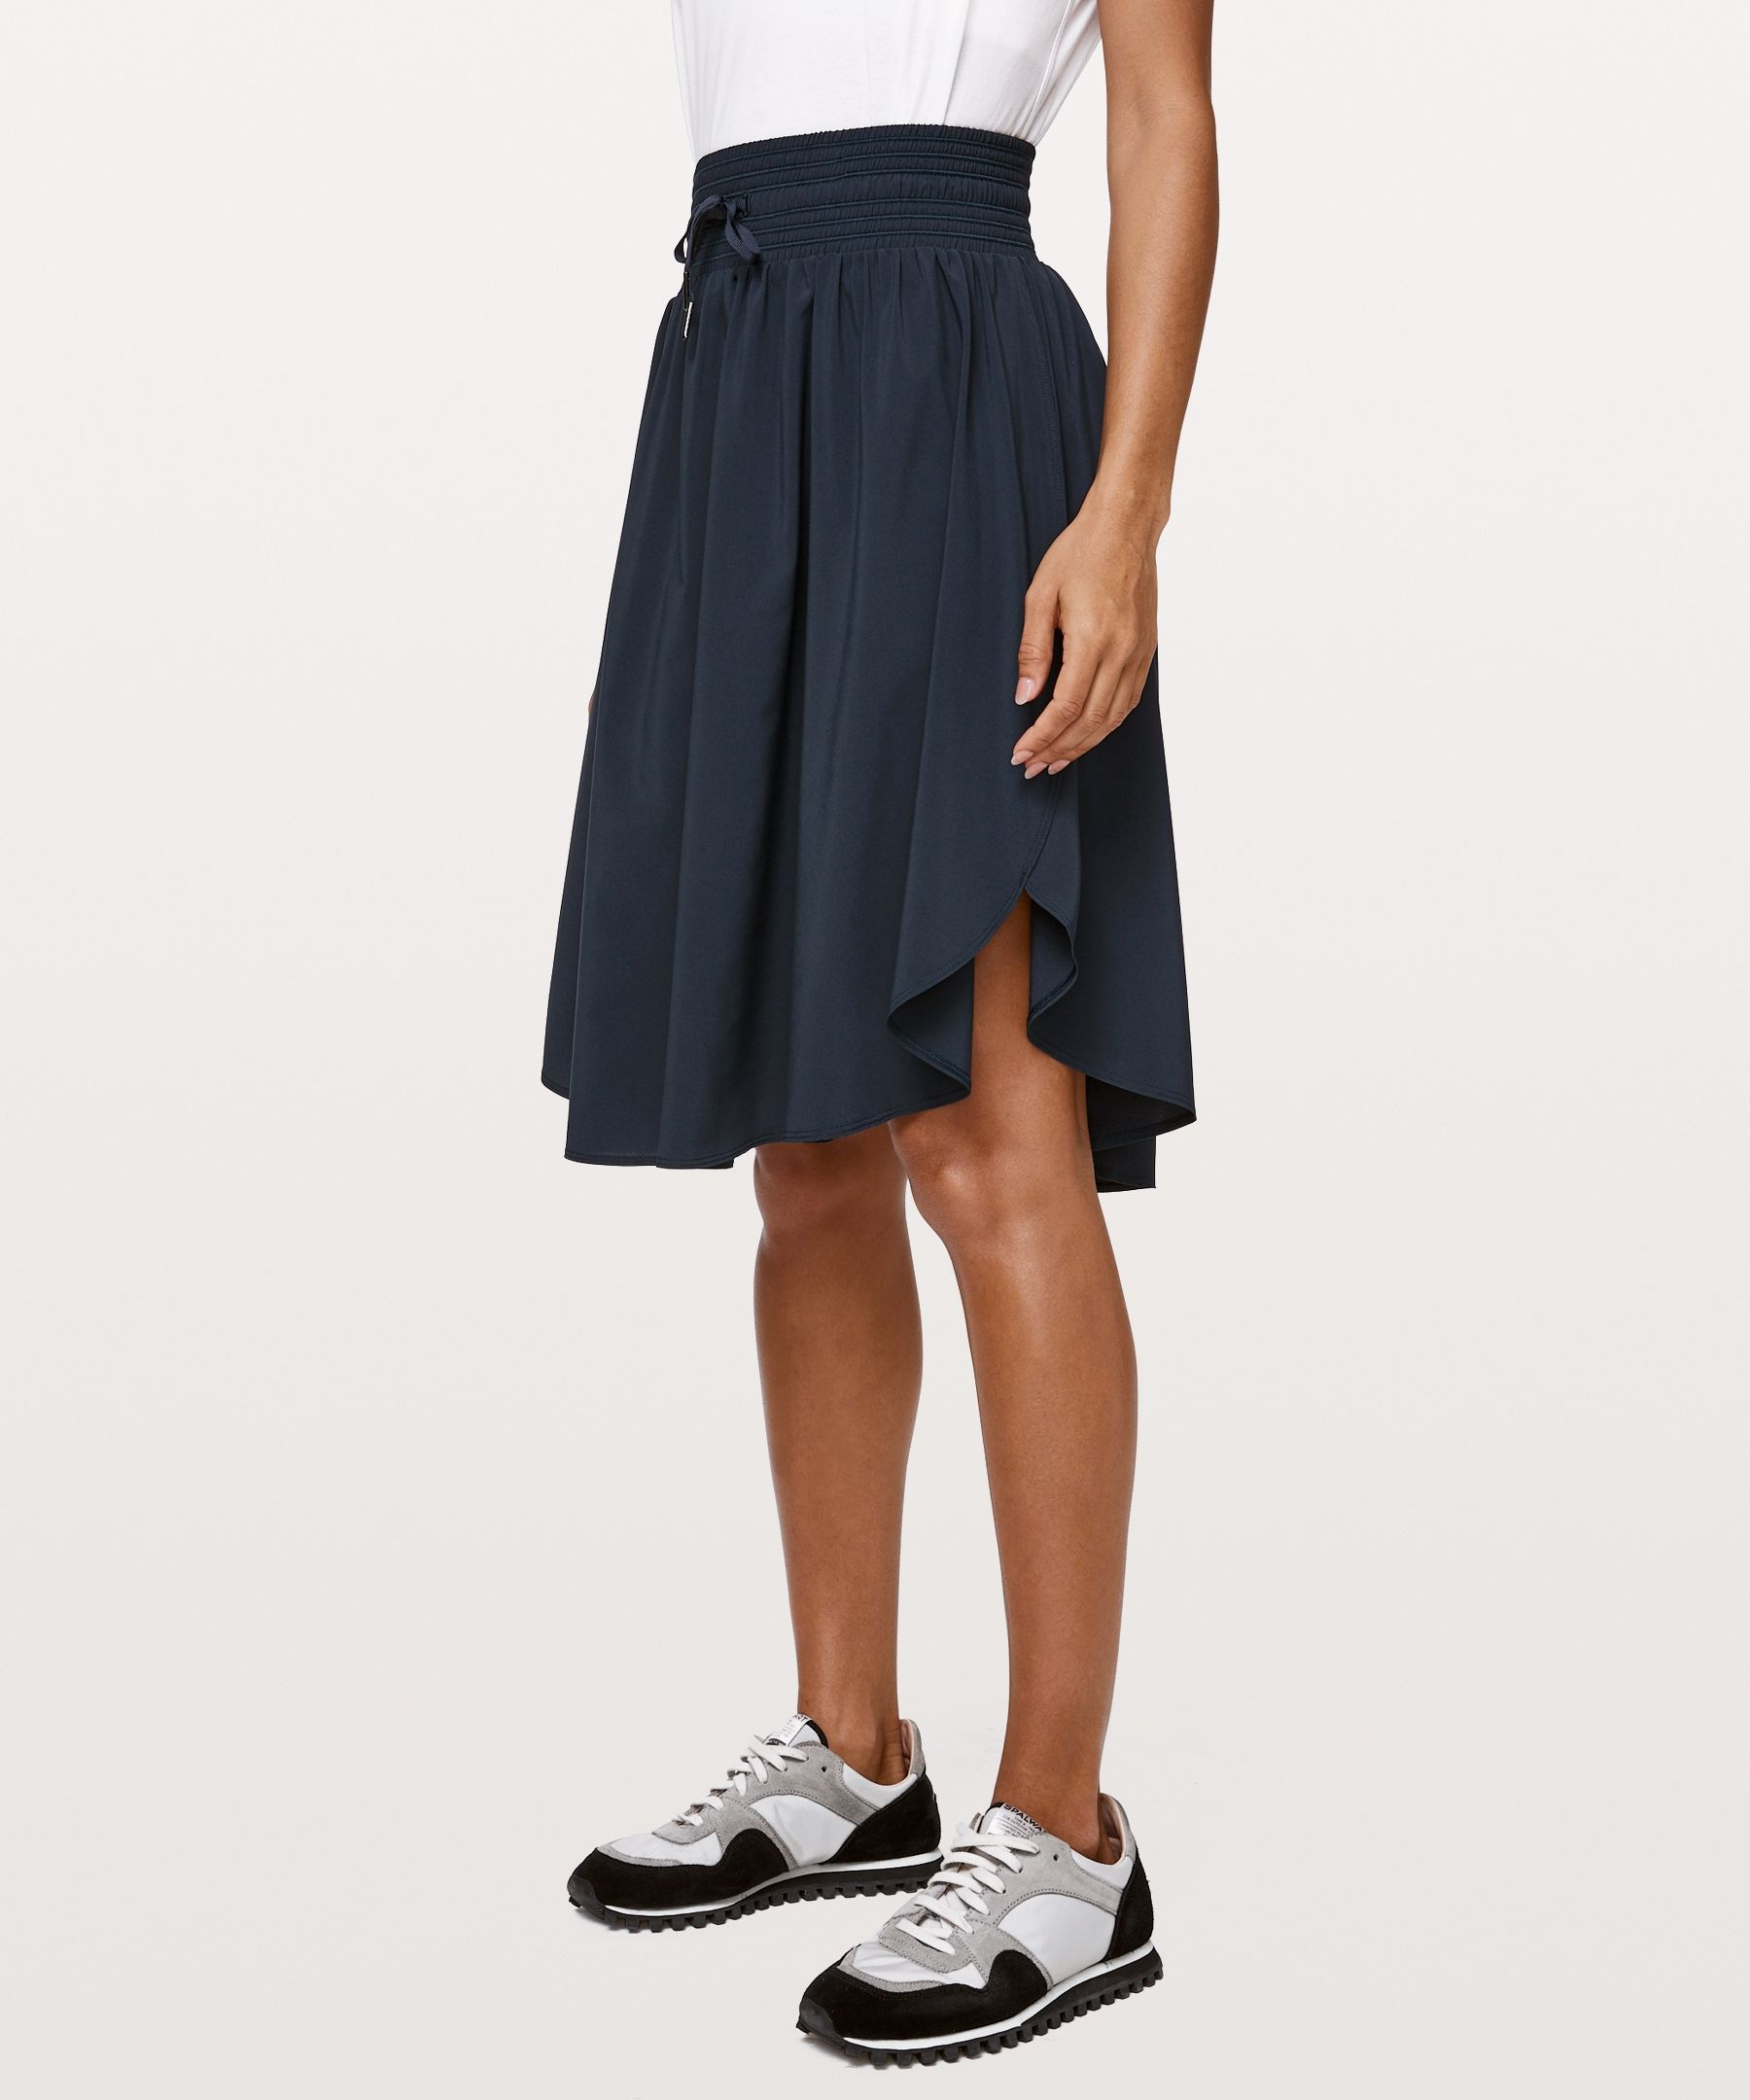 The Everyday Skirt | Women's Skirts | lululemon athletica 1